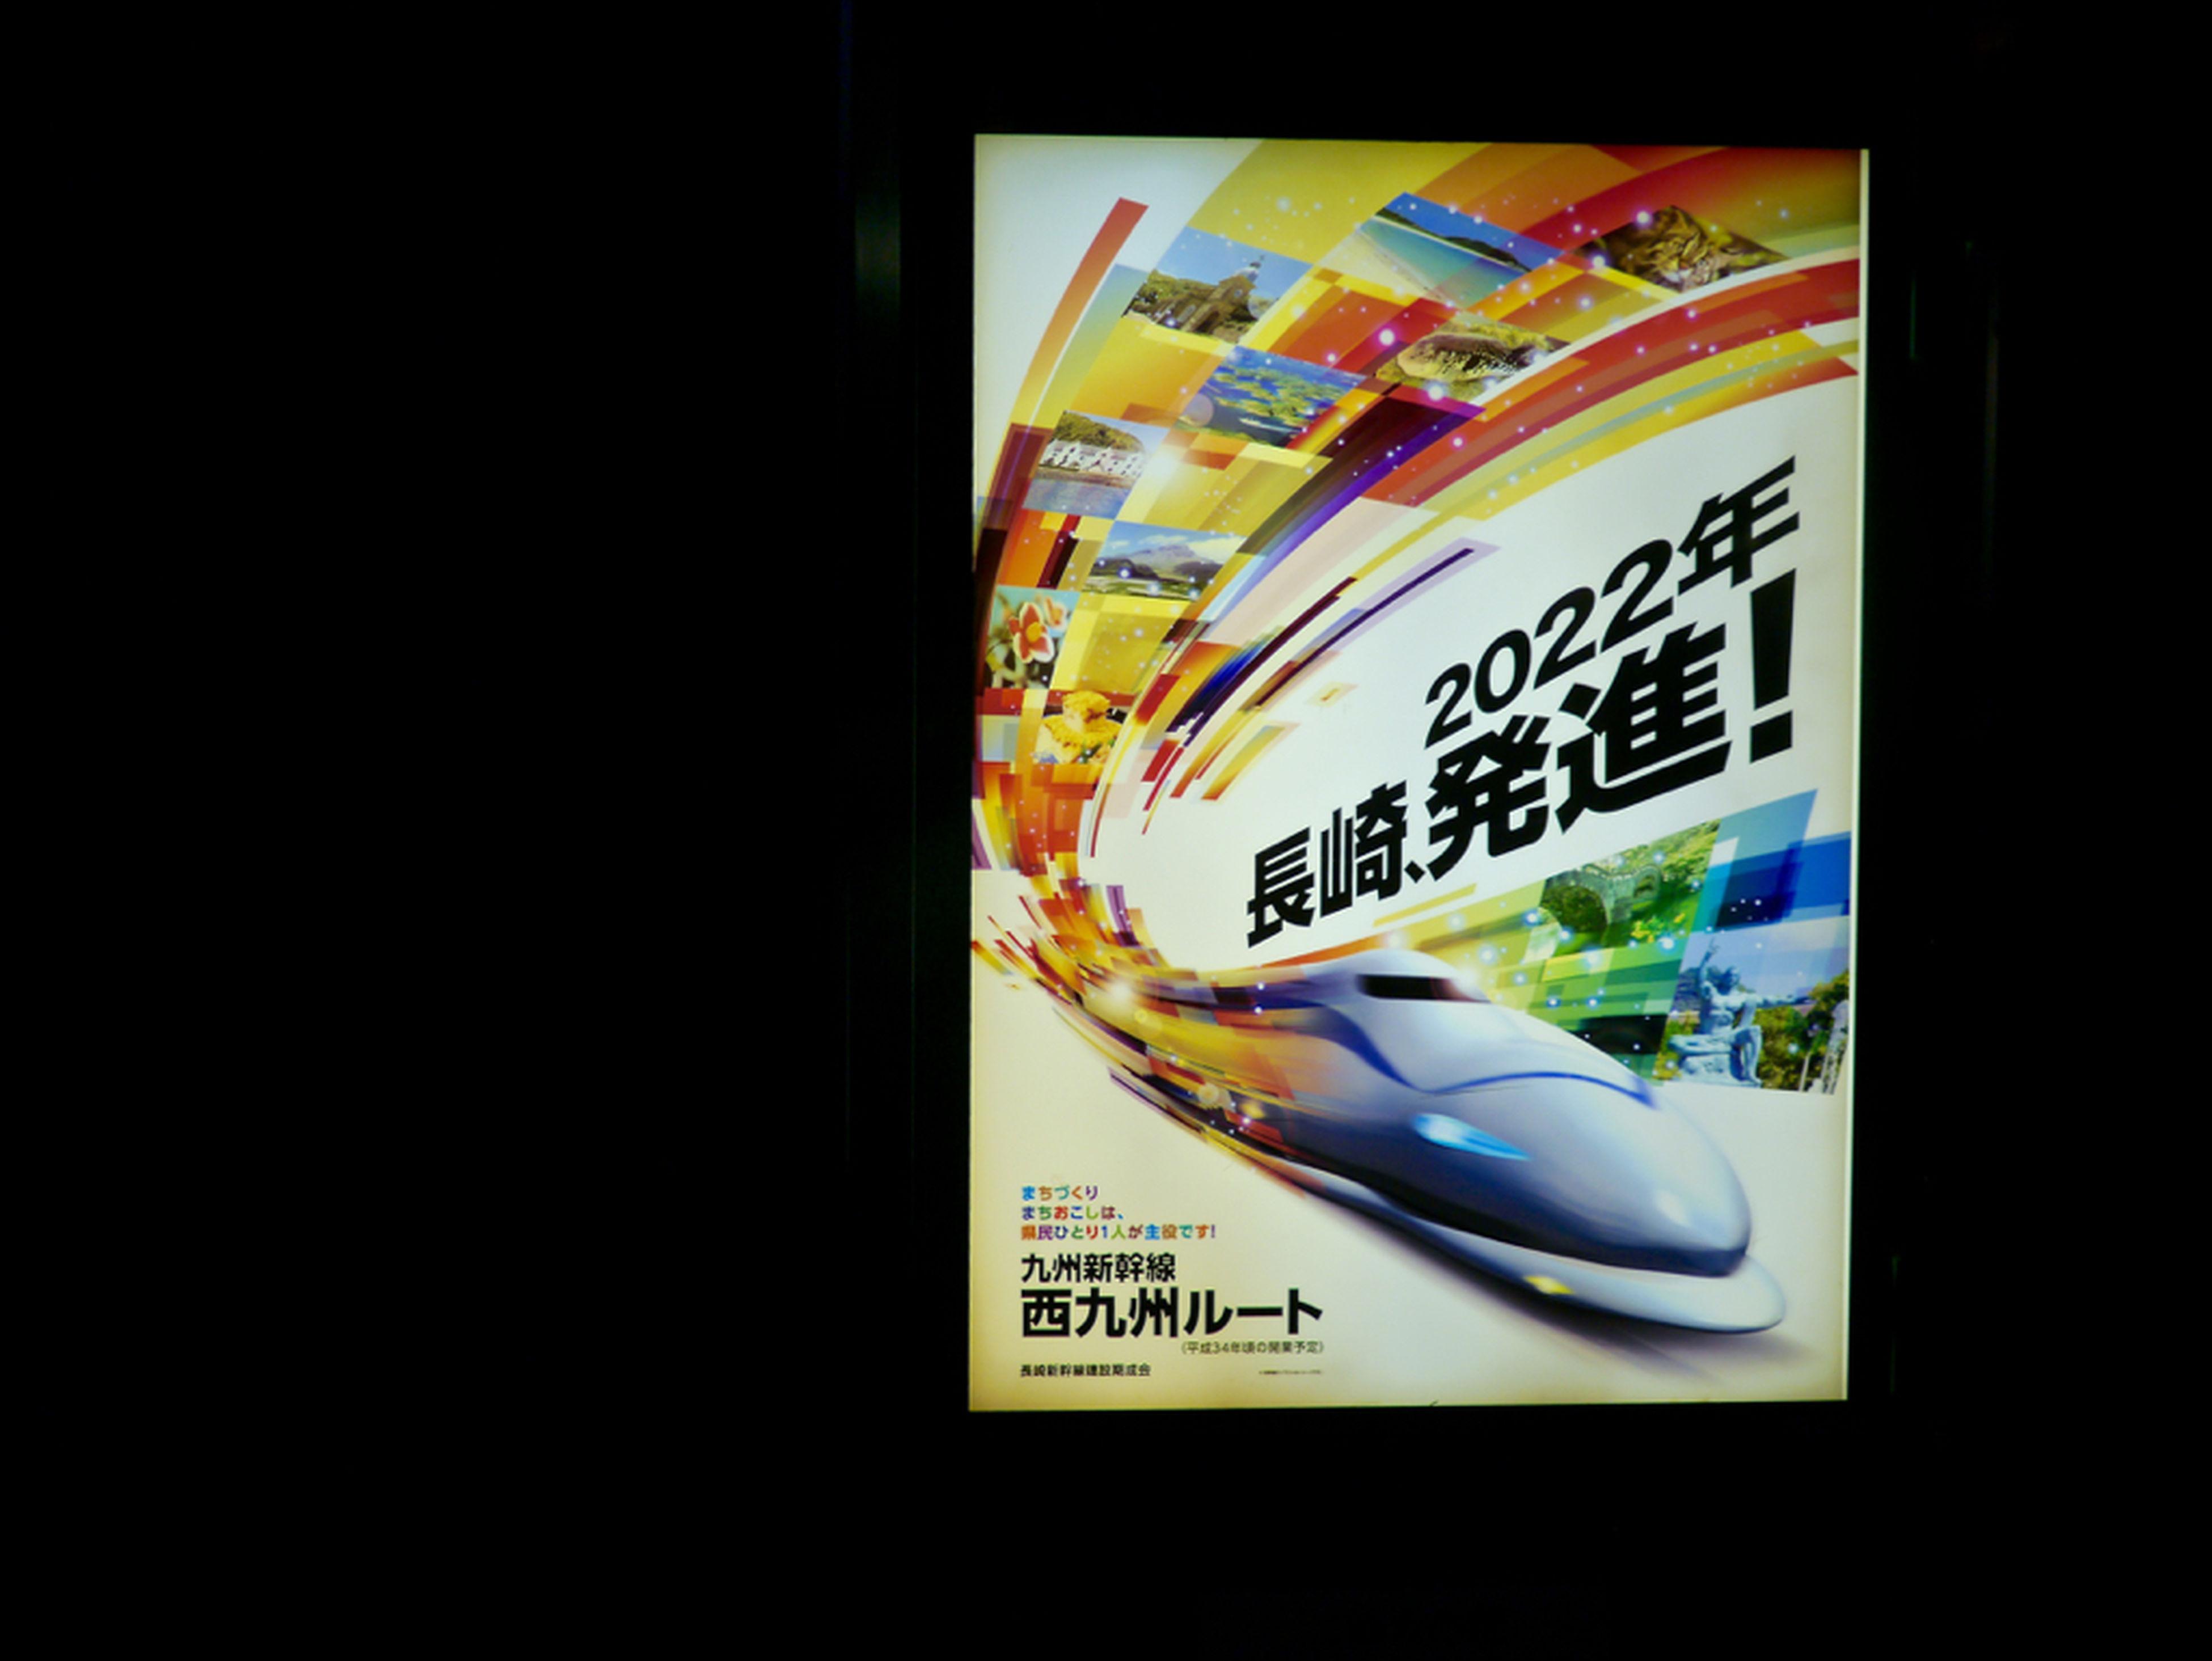 2022 Nagasaki Shinkansen Start, Western Kyusyu route(Shin Tosu - Takeo Onsen - Nagasaki) , 3rd Generation Free Gauge Train Shinkansen Image. FGT-9000 Test run Sendai Station, Kagoshima https://youtu.be/nygqLyoSxBg Watch HD Video PC/Mac Recommend de See you Next FGT-9000 Gauge Changeable Train Gauge Convertible Train JR Kyushu Looking Into The Future Nagasaki Station Night Light Off Shot Poster Art Shinkansen